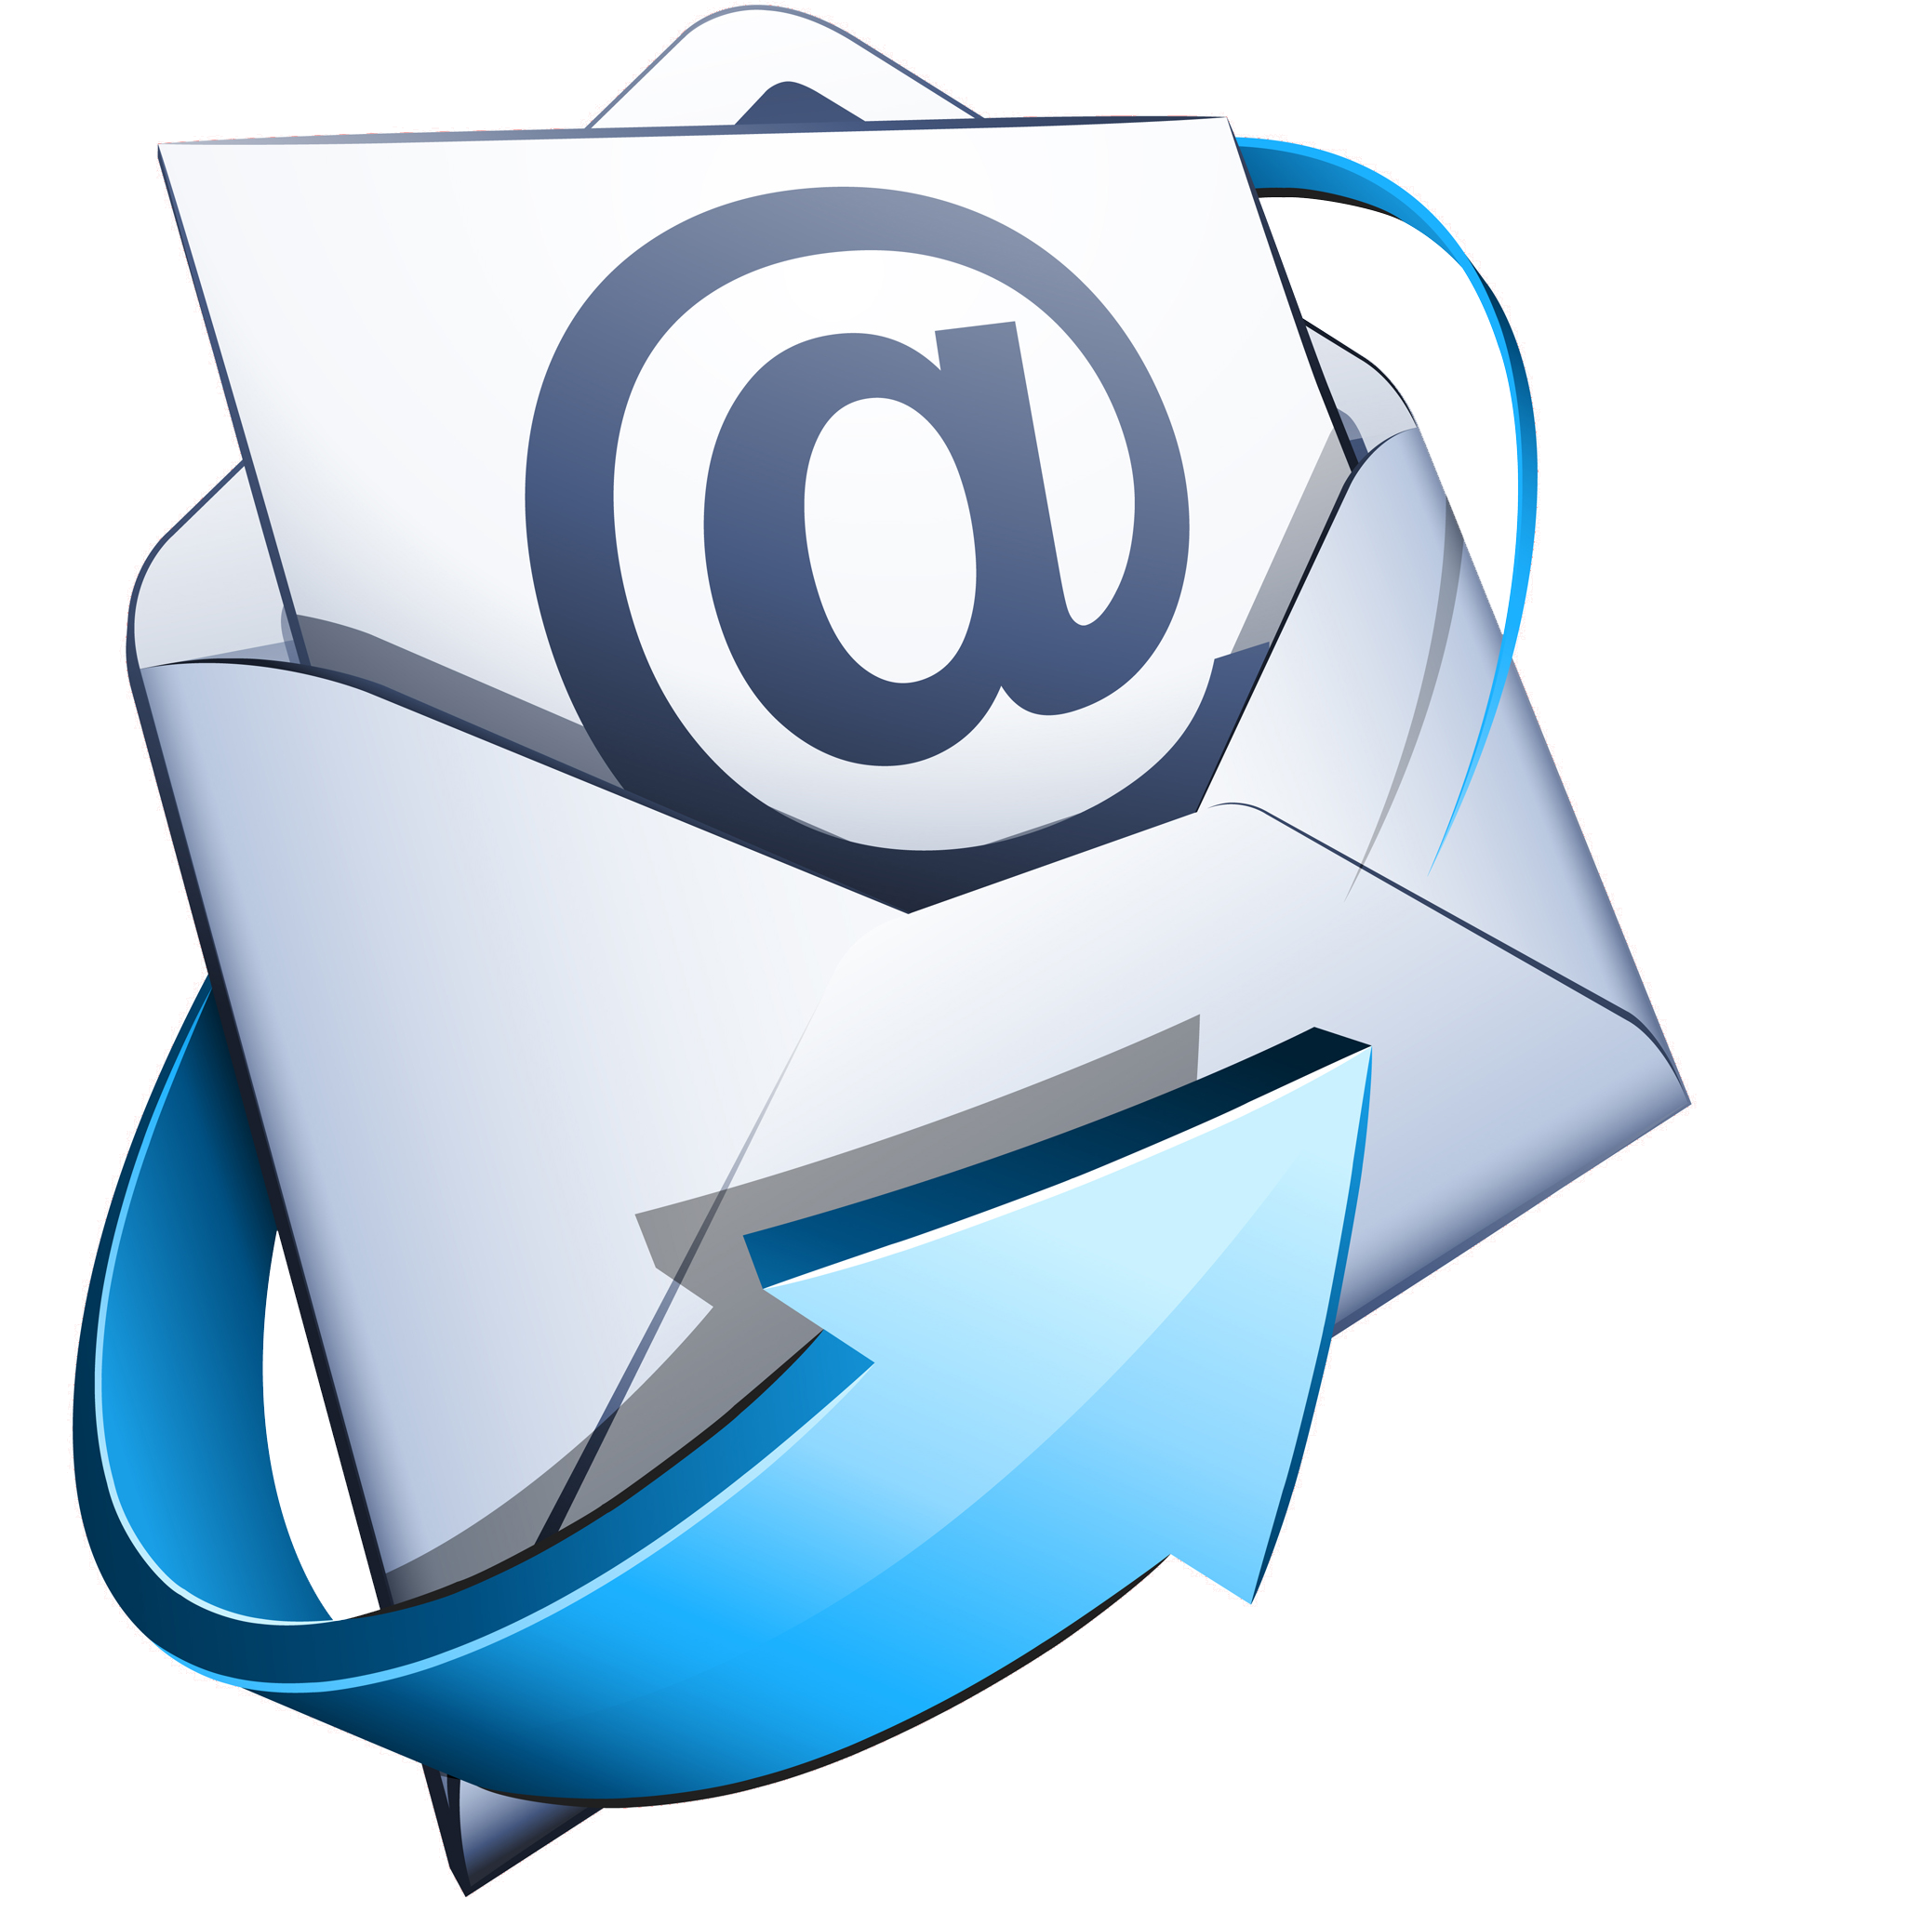 Download Email Internet Png HQ PNG Image | FreePNGImg